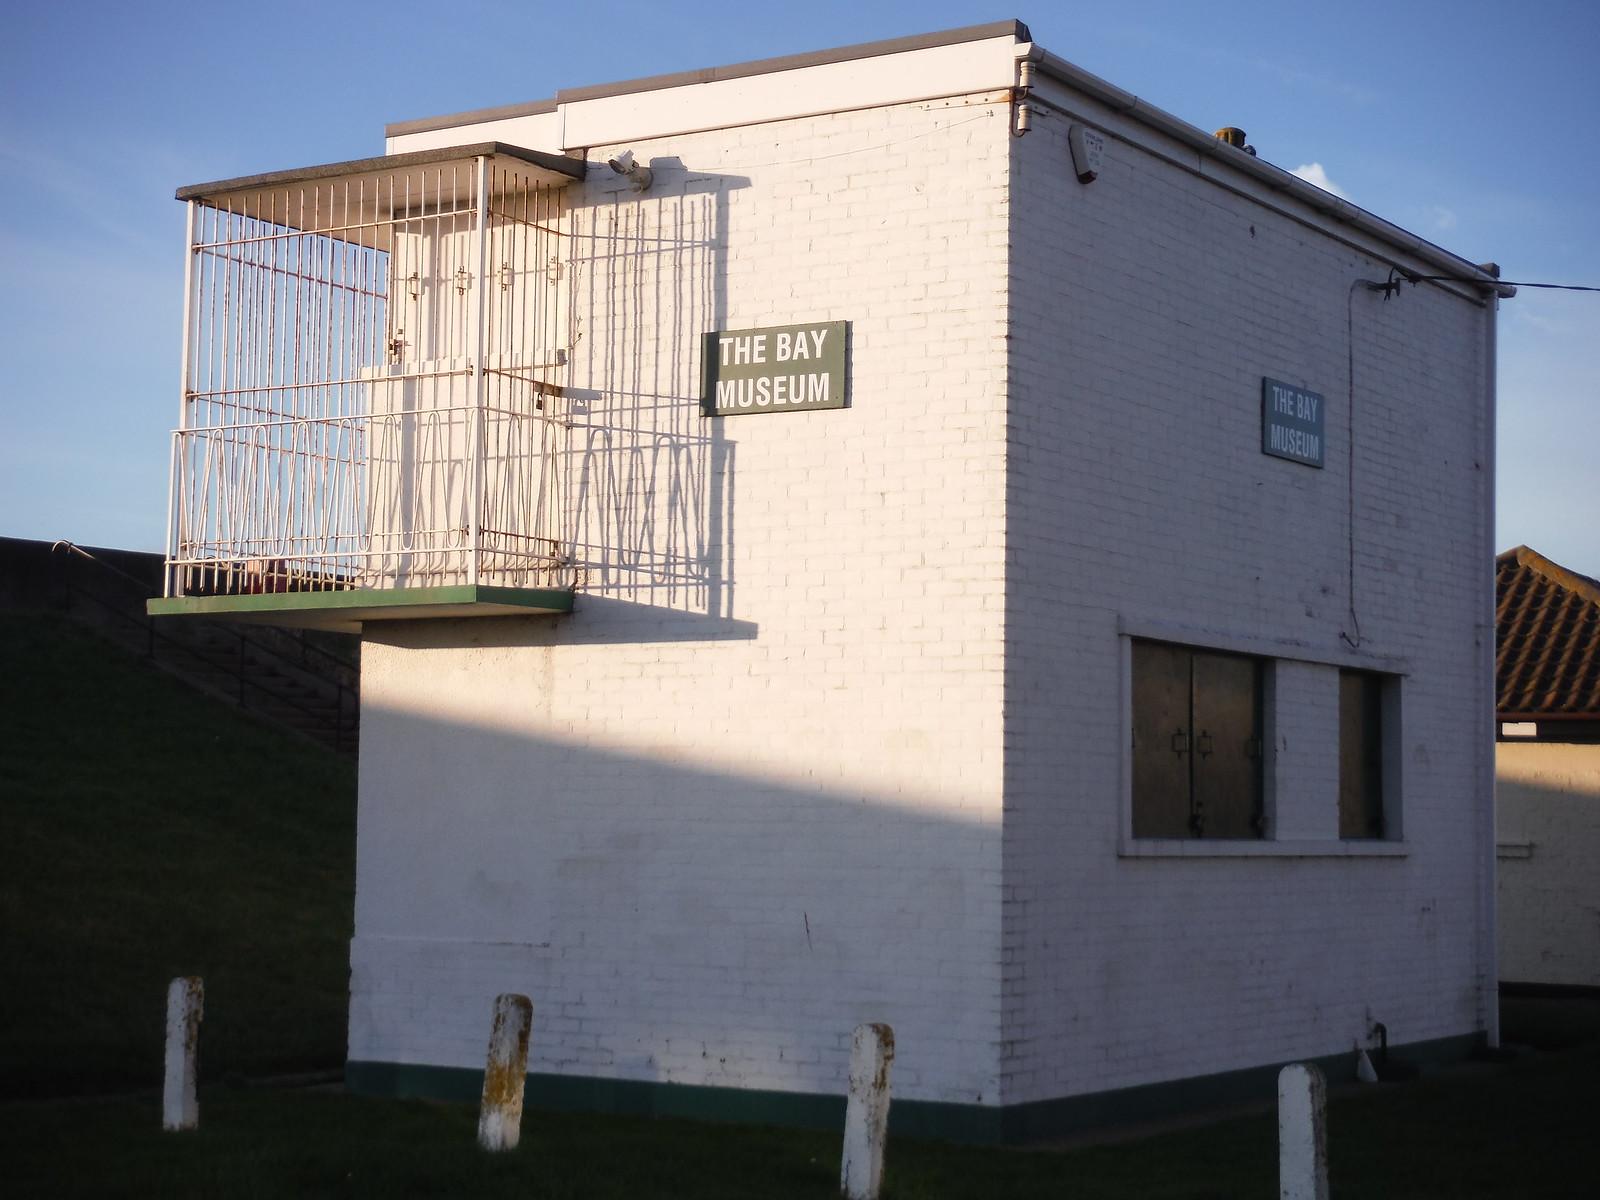 The Bay Museum, Thorney Bay, Canvey Island SWC Walk 258 Benfleet Circular (via Canvey Island)